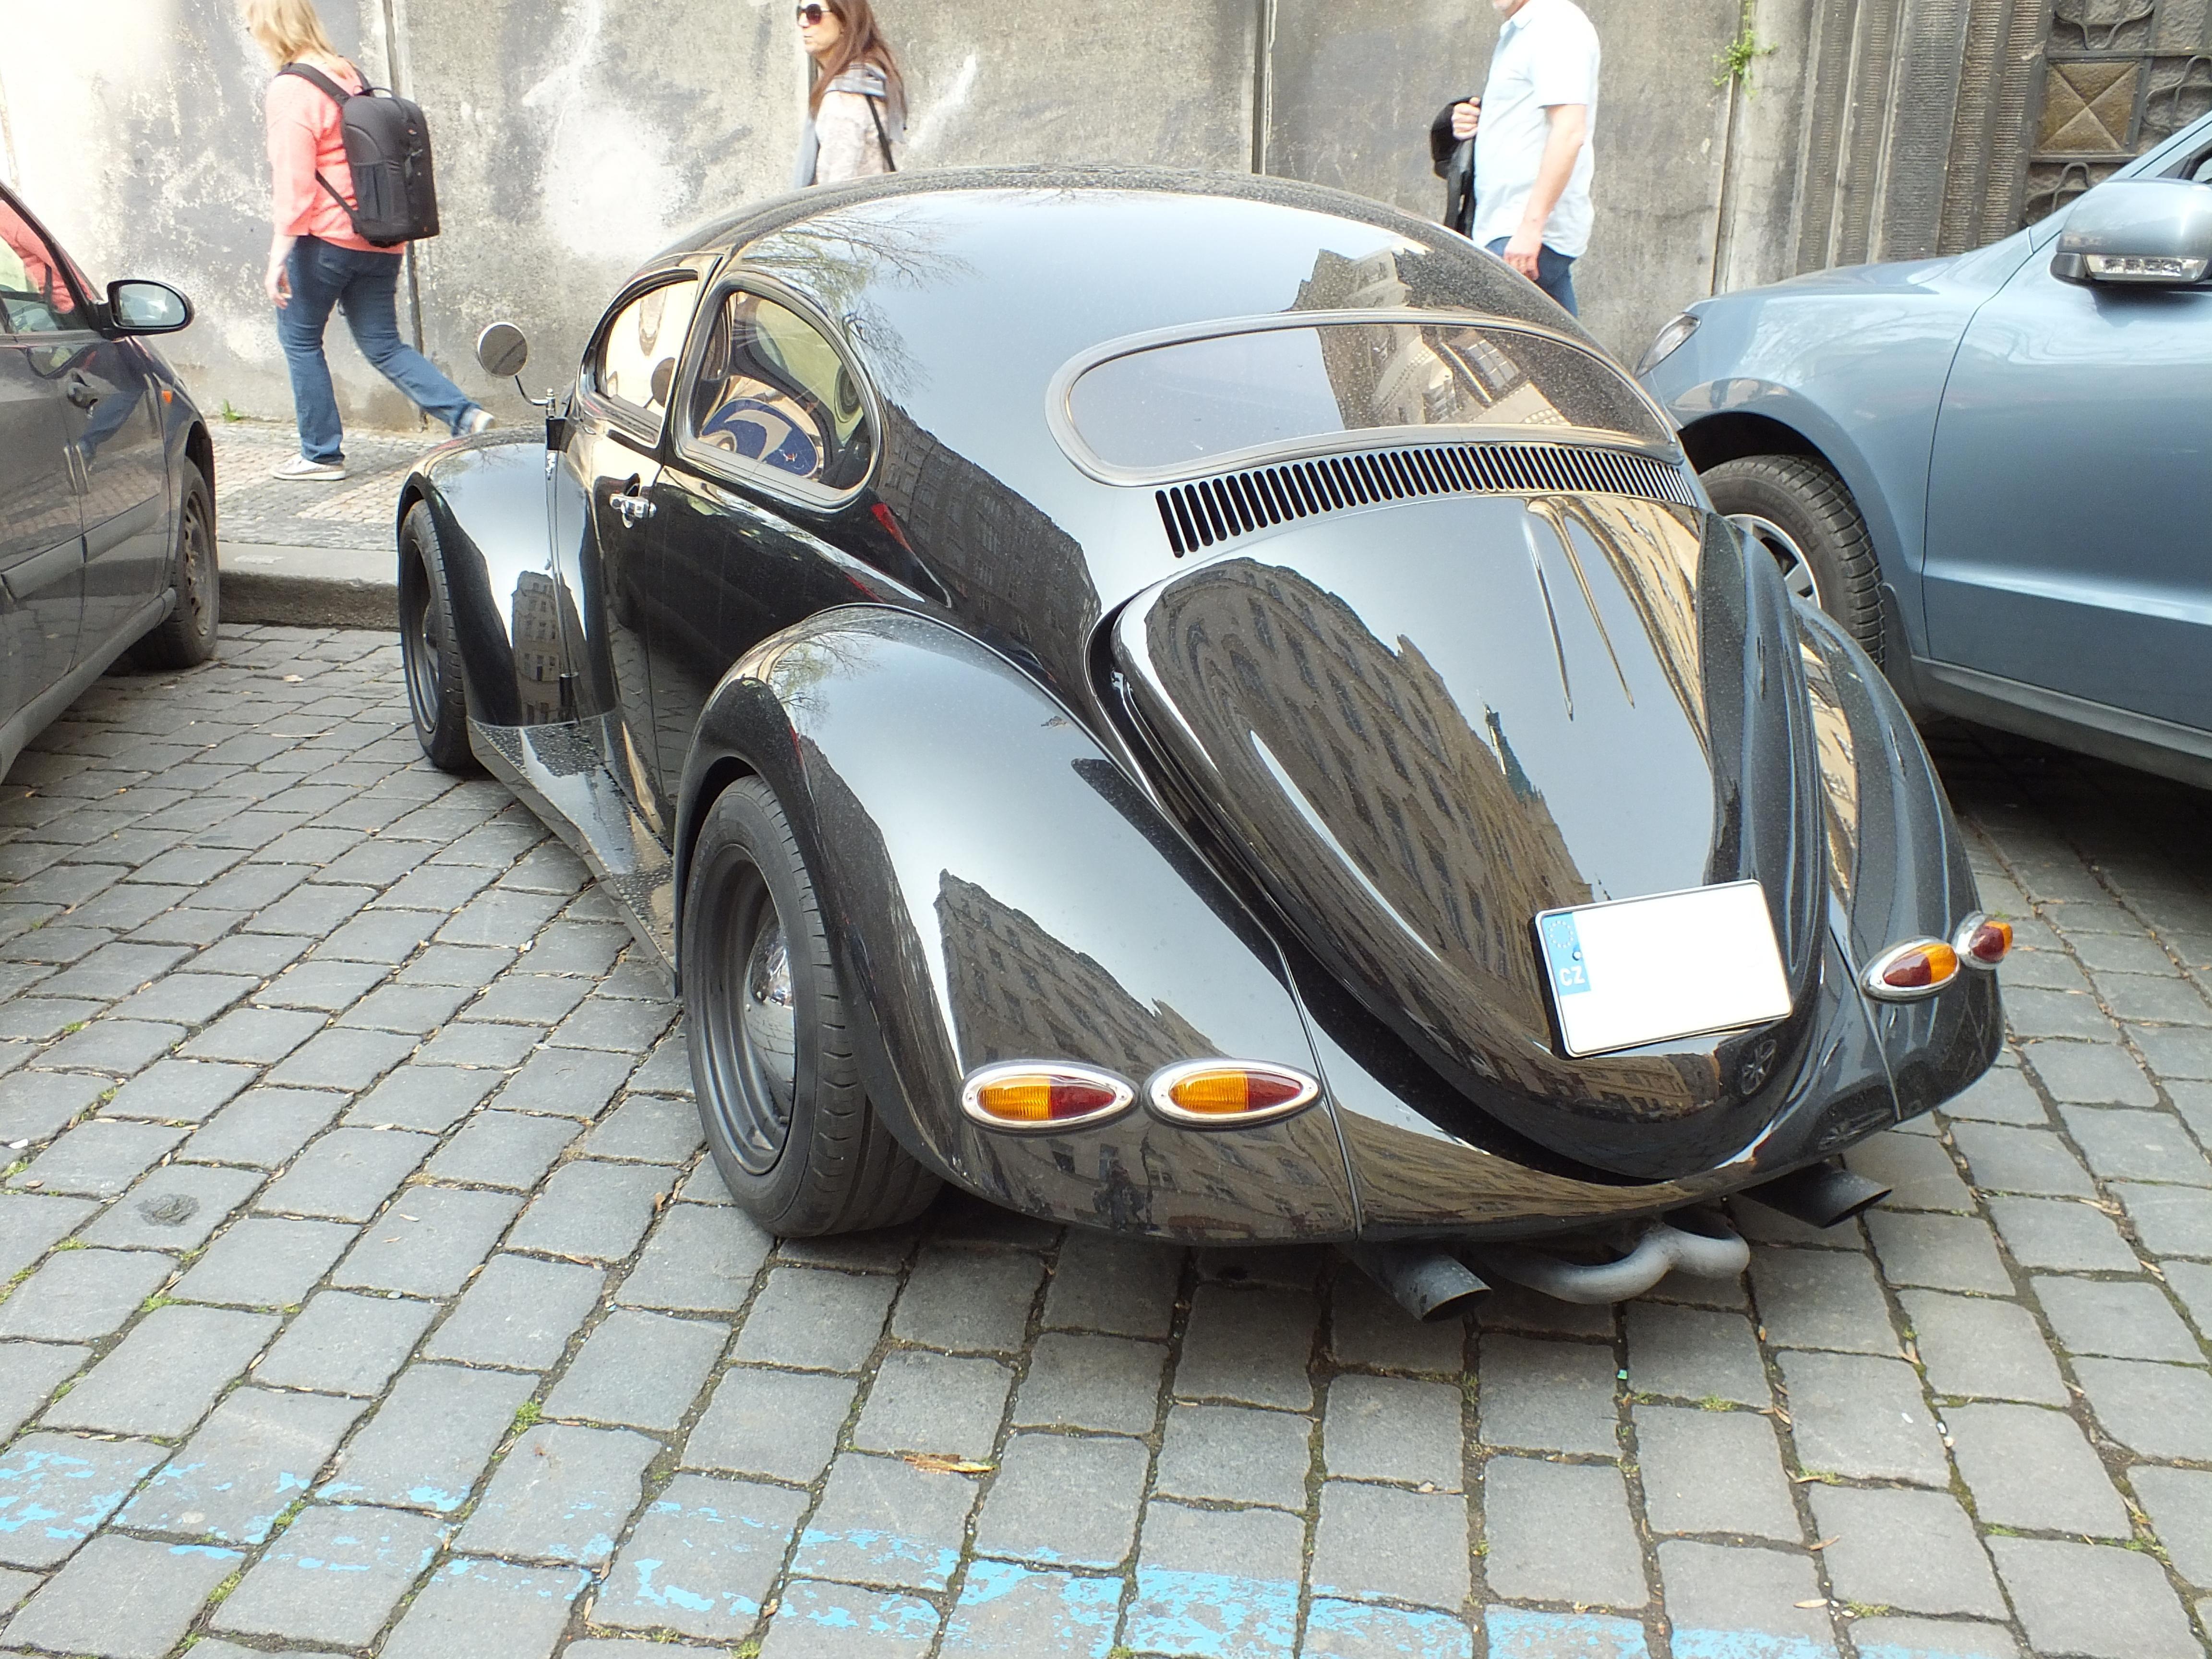 Vw Dune Buggy >> Cars volkswagen beetle tuning bug lowrider beast classic retro wallpaper | 4608x3456 | 651600 ...